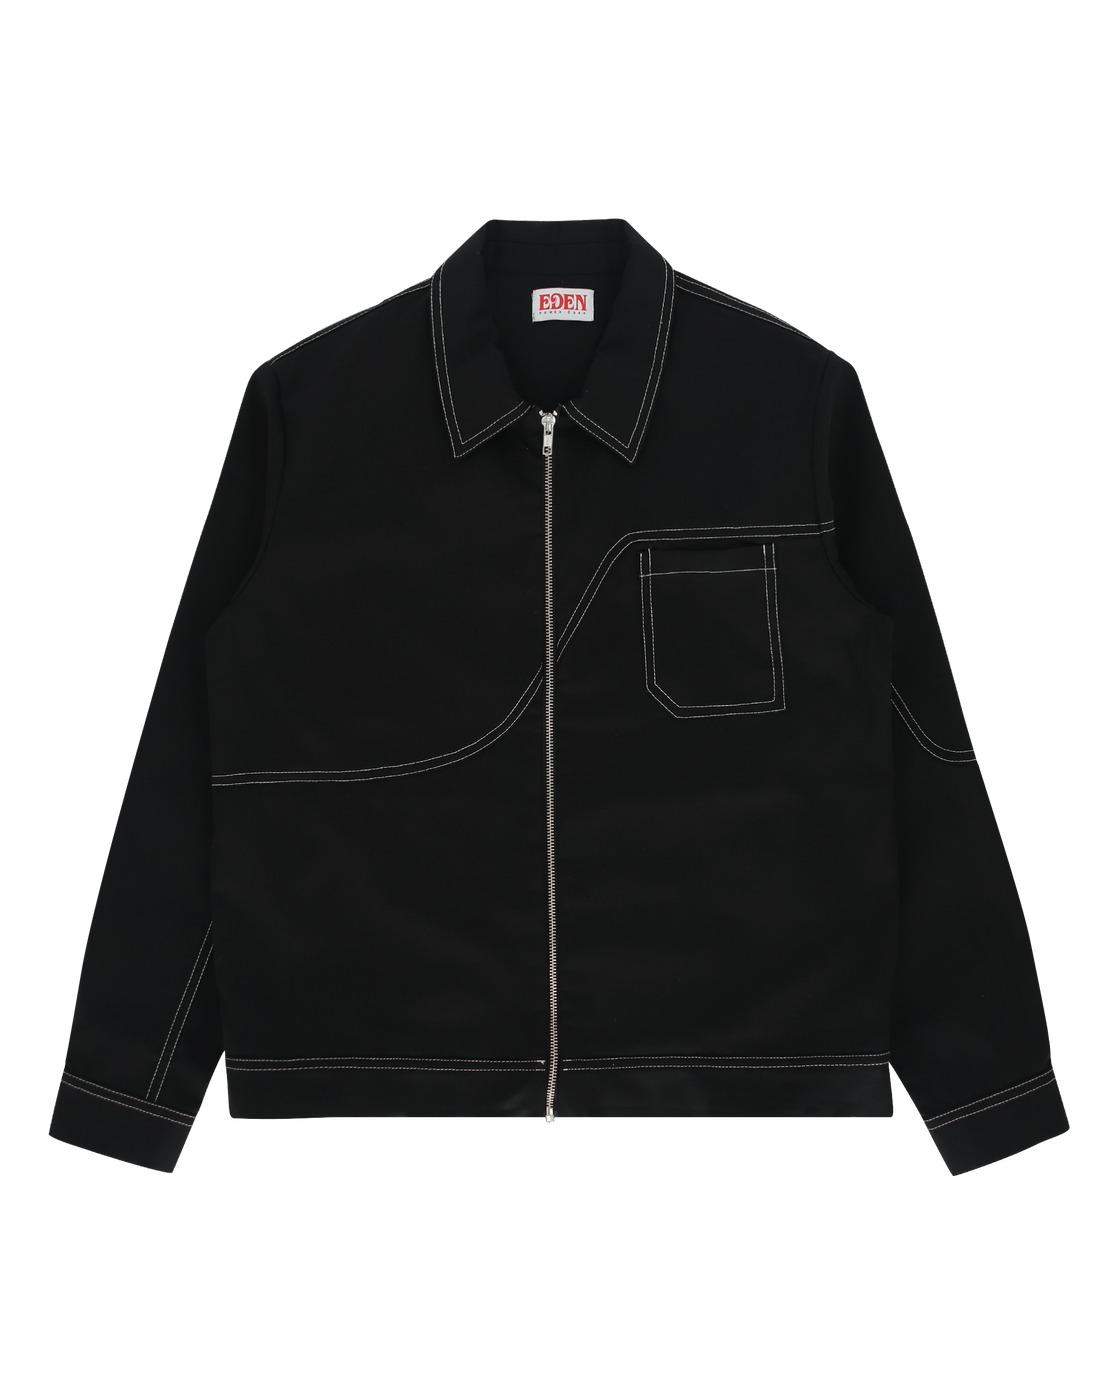 Eden Power Corp Corp Jacket Black